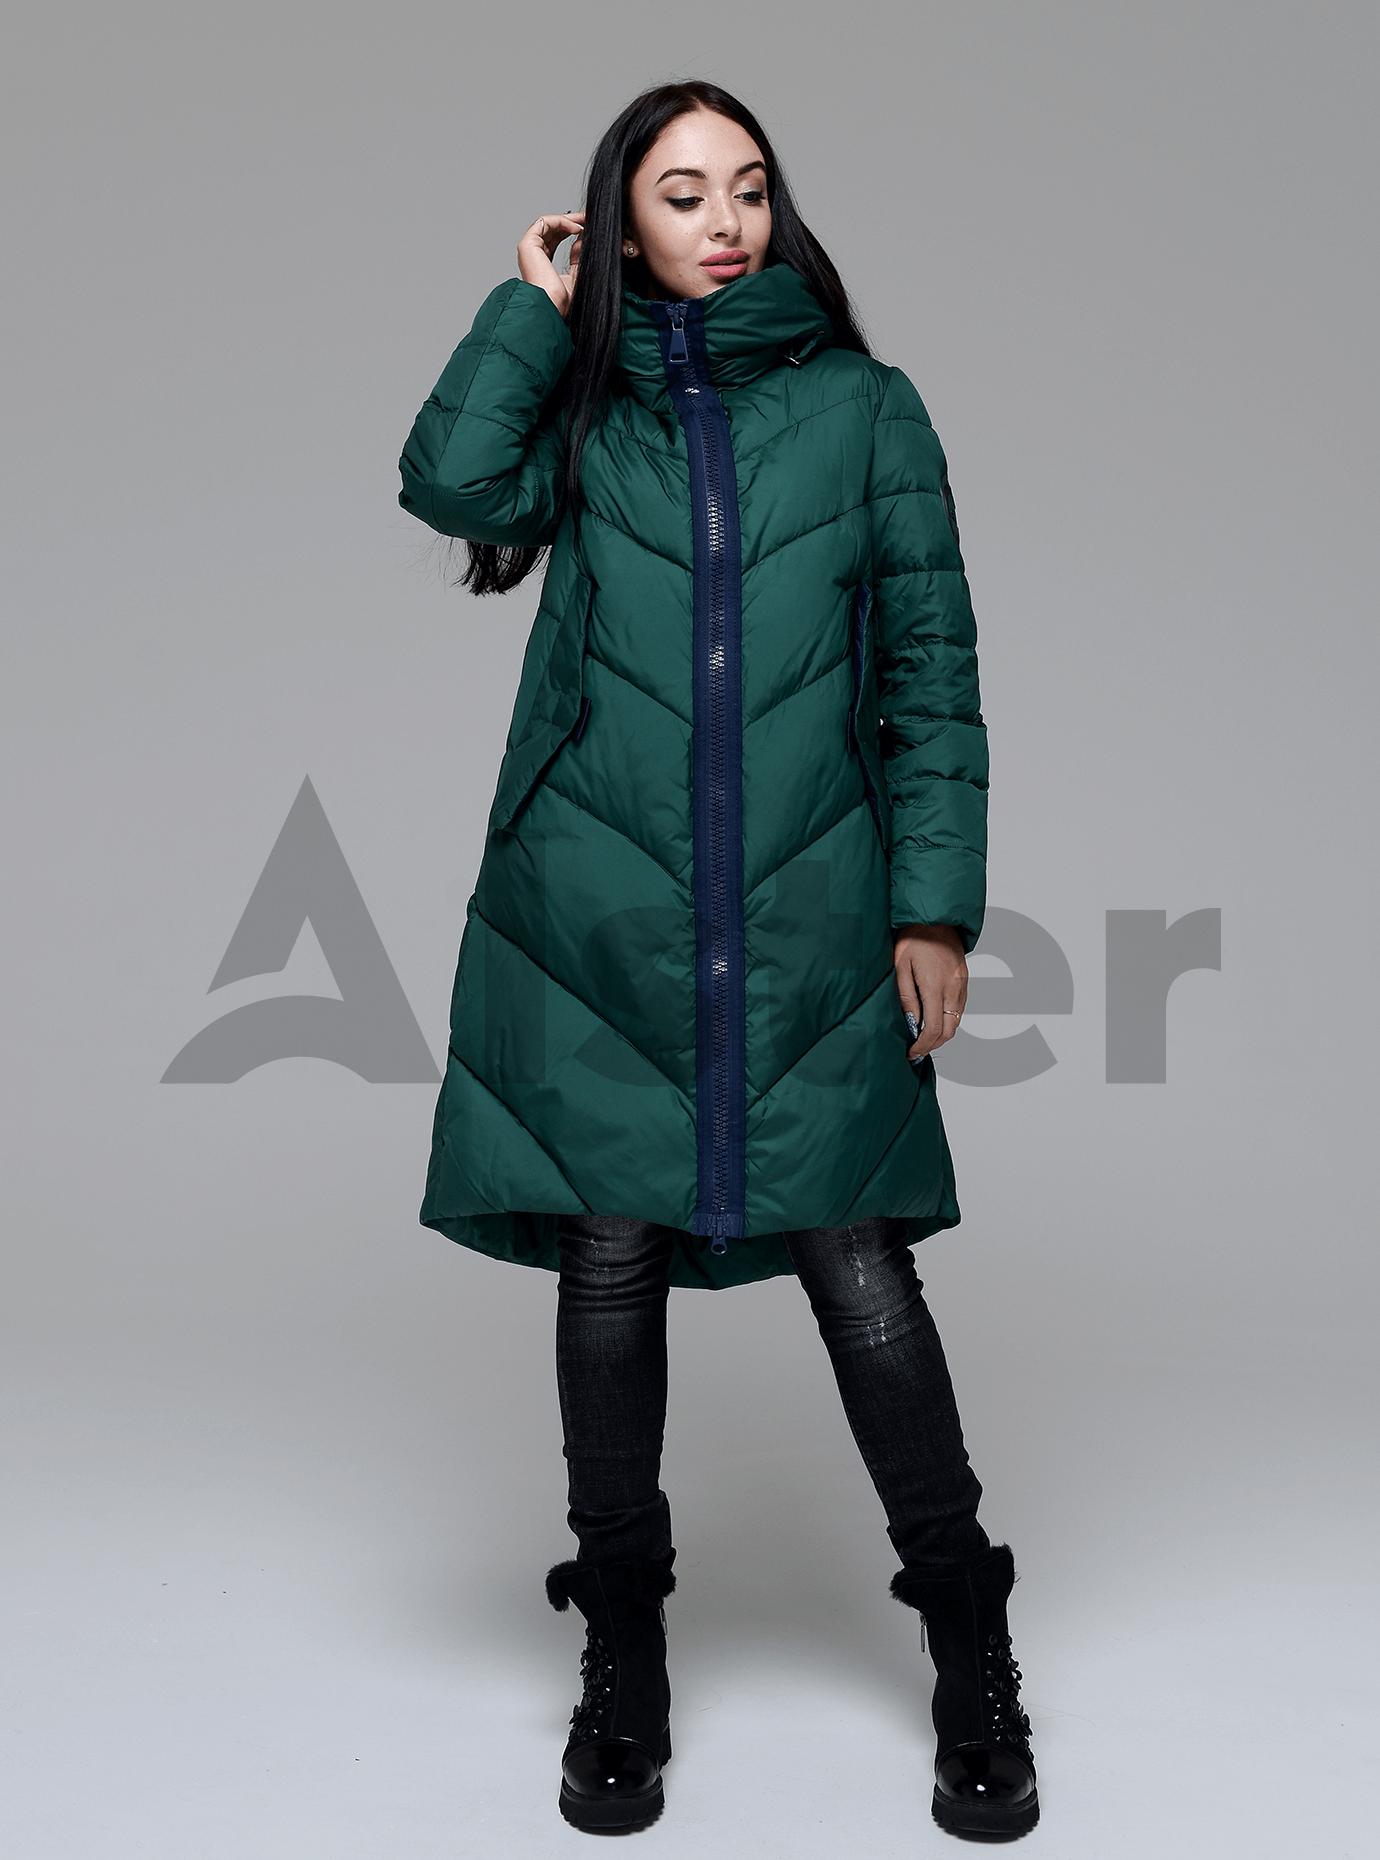 Пуховик стеганый женский Тёмно-зелёный S (02-4634): фото - Alster.ua